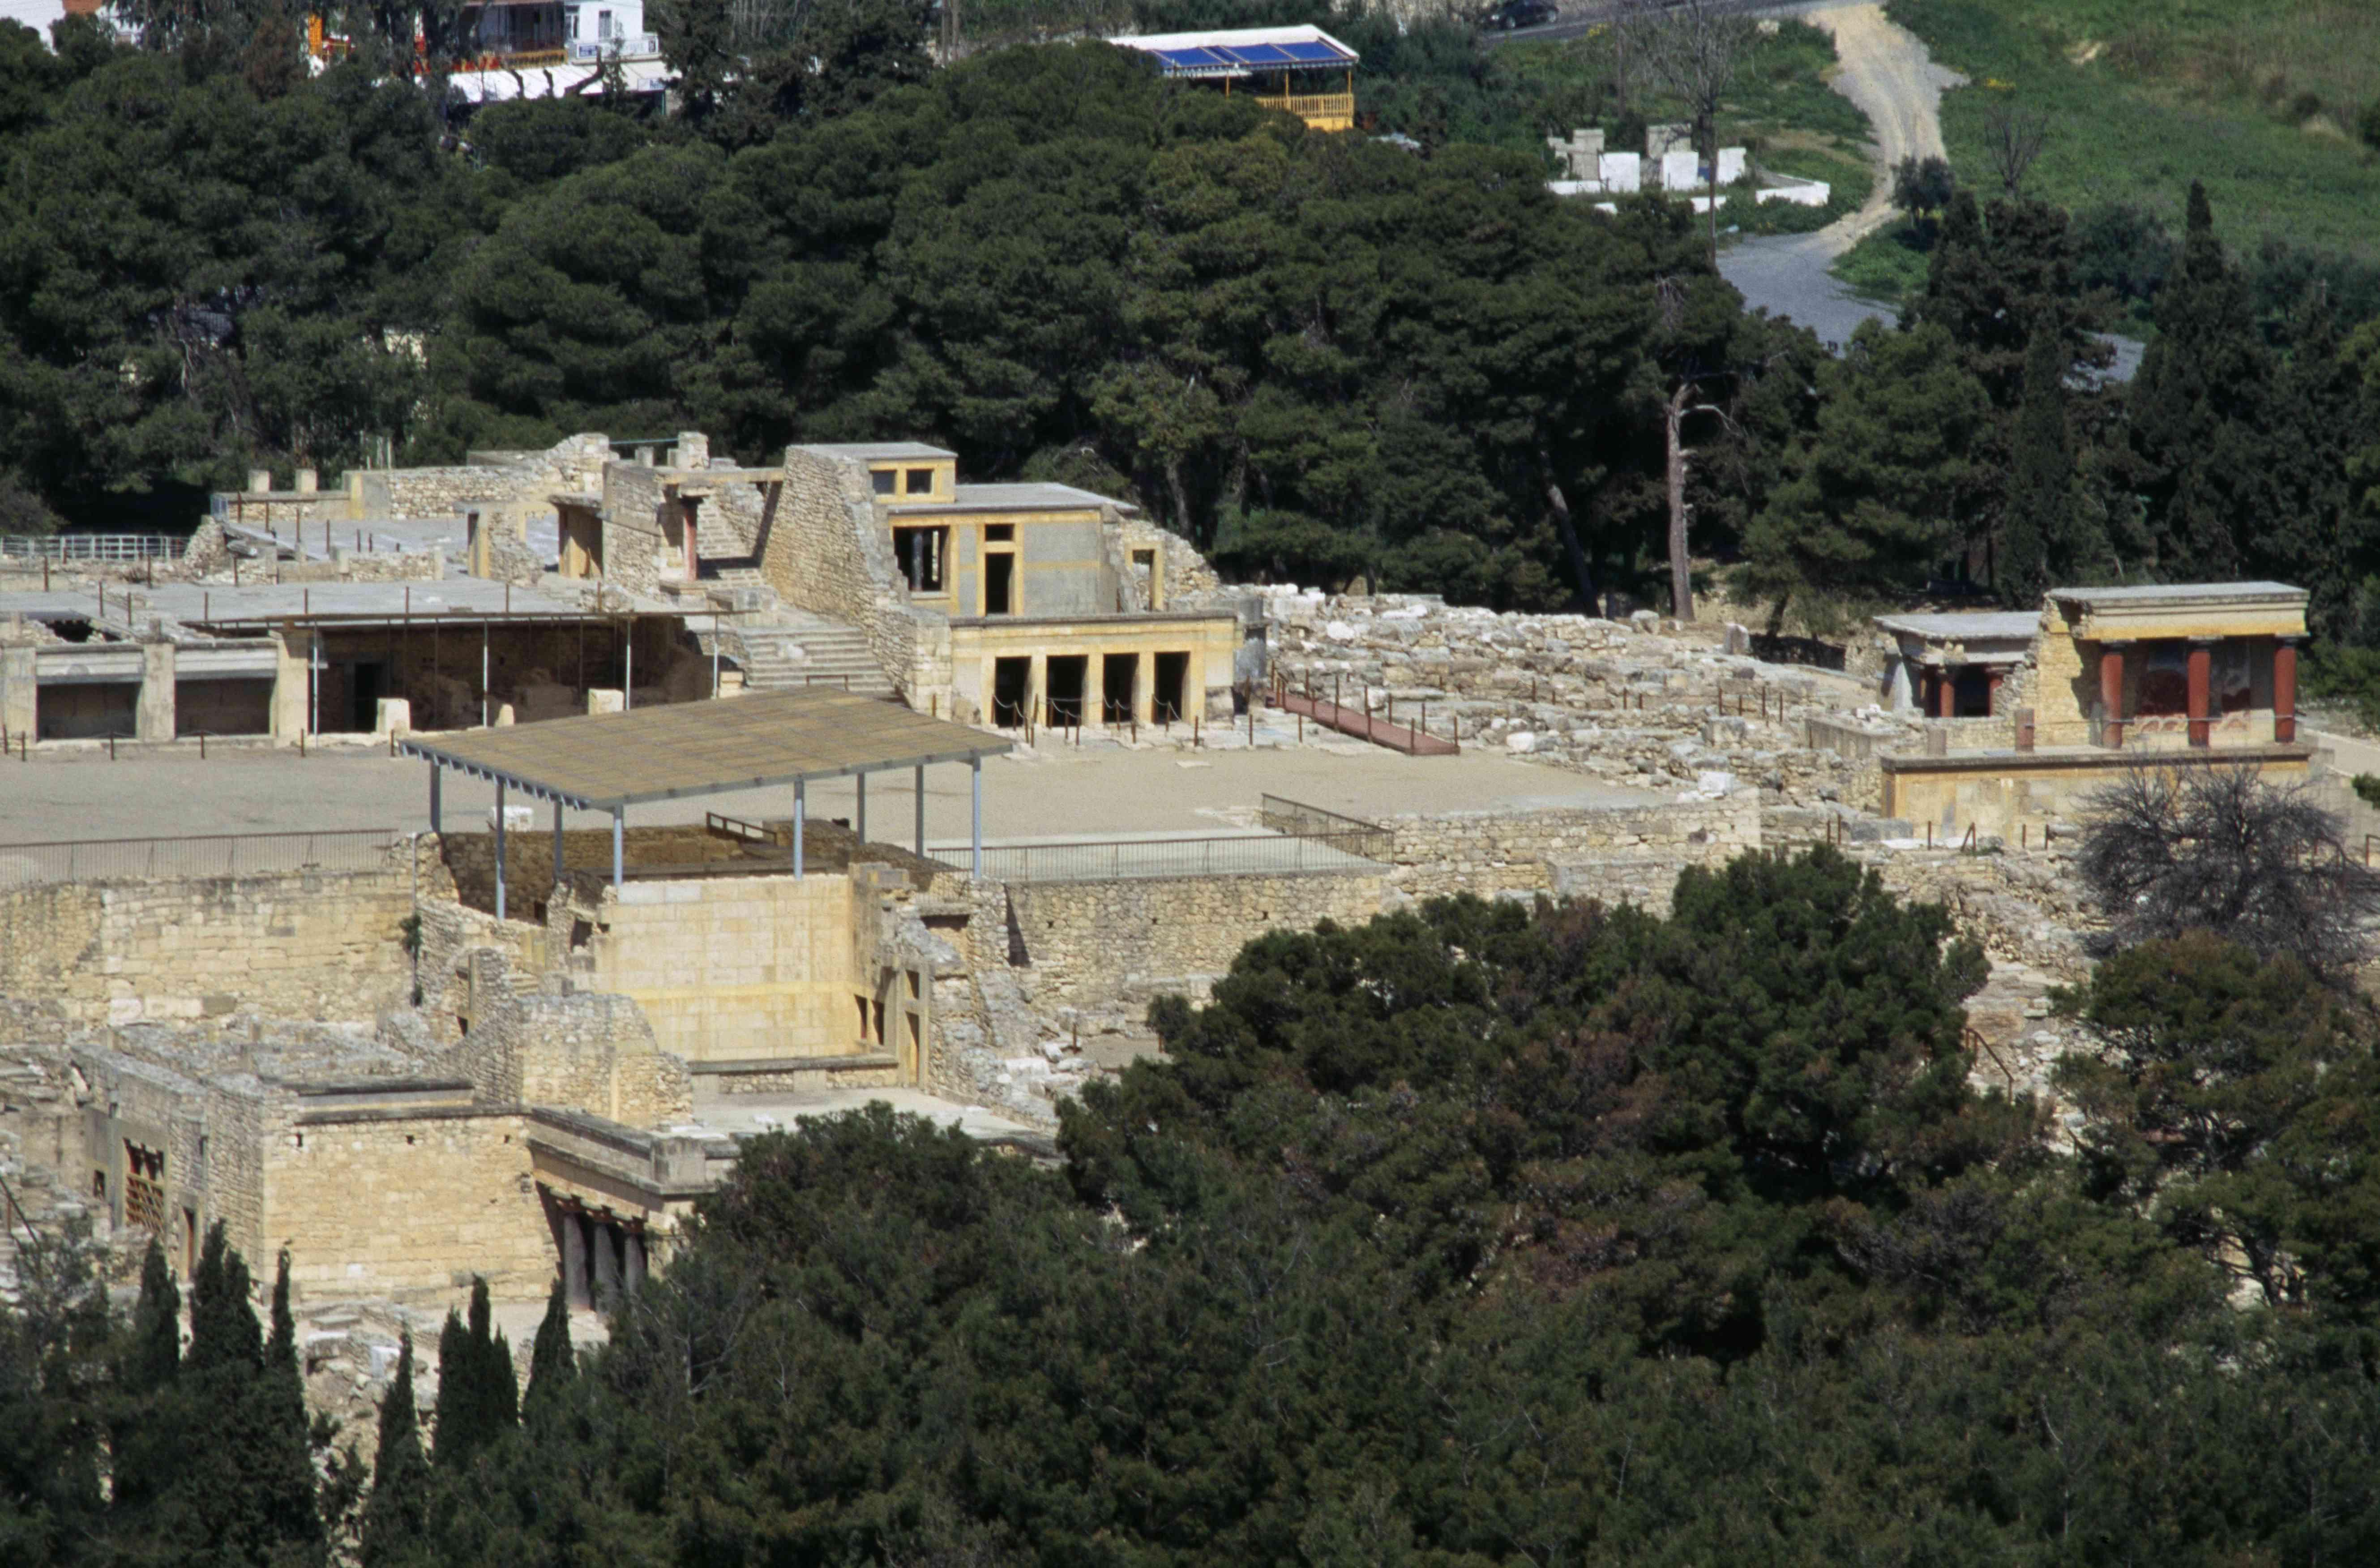 View of Palace of Knossos, Crete, Greece, Minoan civilization, 18th-15th century BC